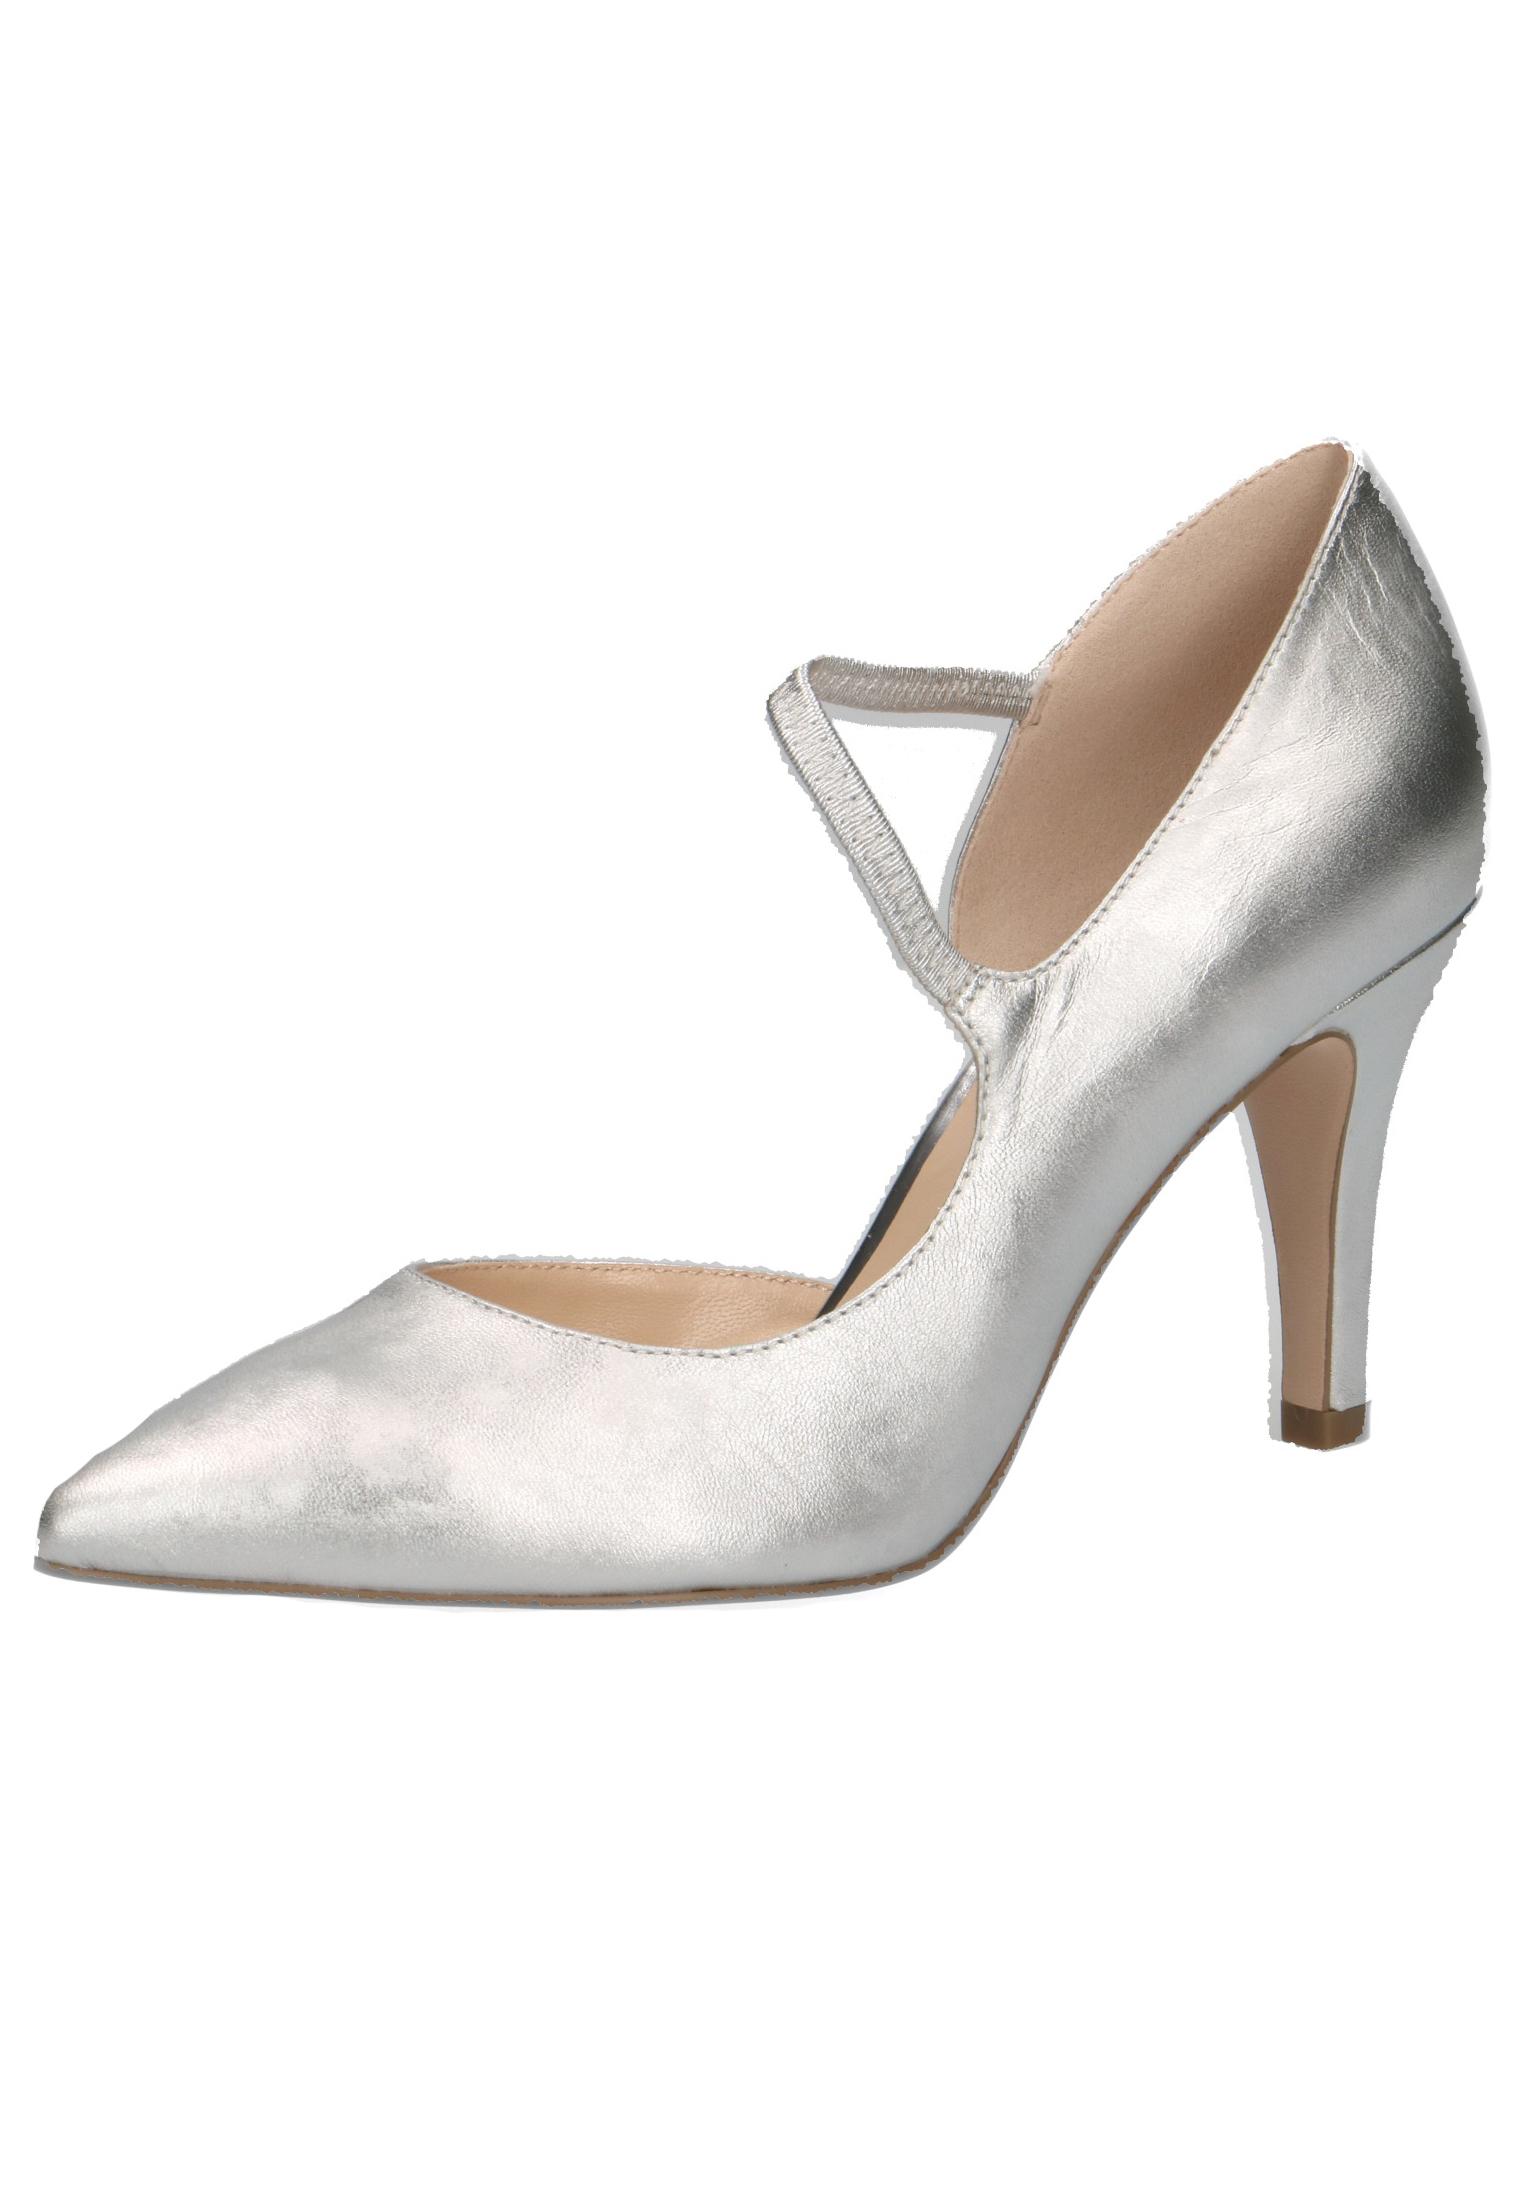 9 966 Leder Schwarz Silver Pumps Satin High 24402 Heel Silber 22 Damen Caprice Sling vYf6g7yb